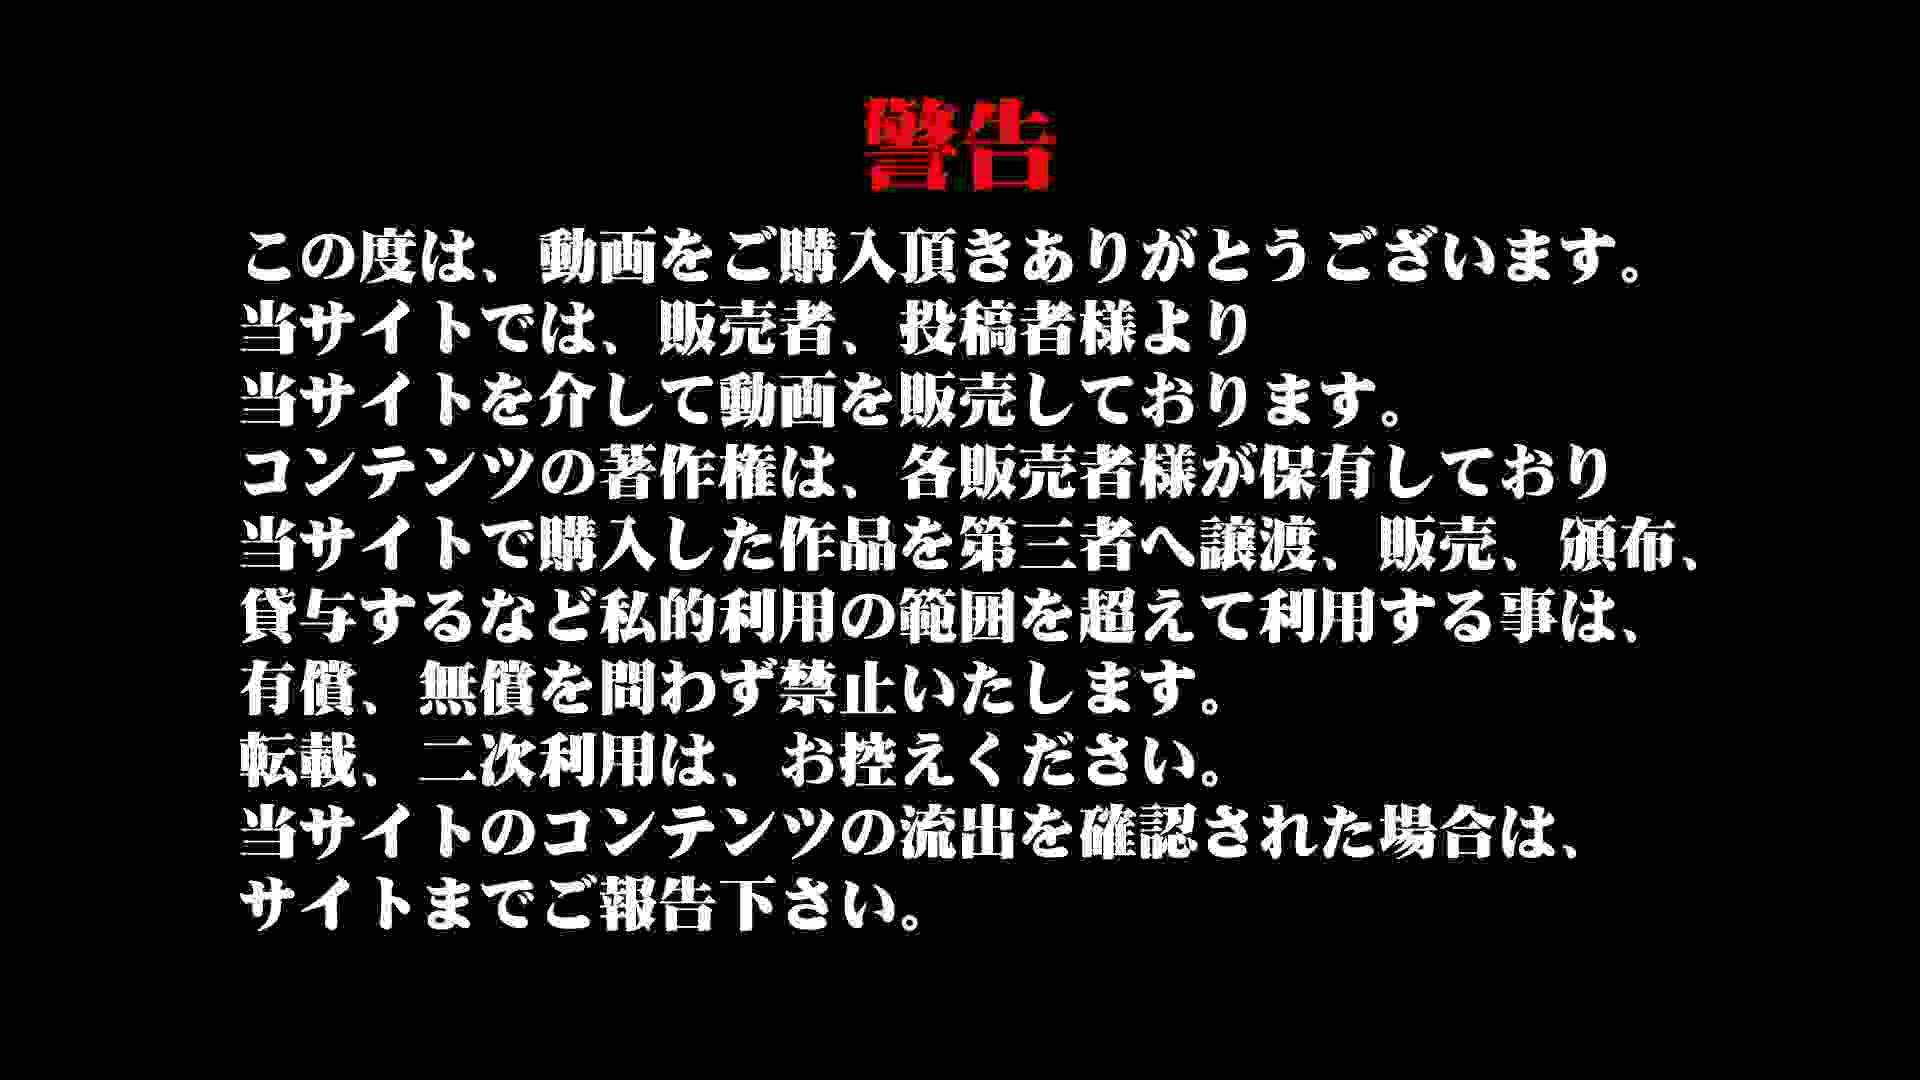 Aquaな露天風呂Vol.894 盗撮大放出 セックス画像 67連発 3